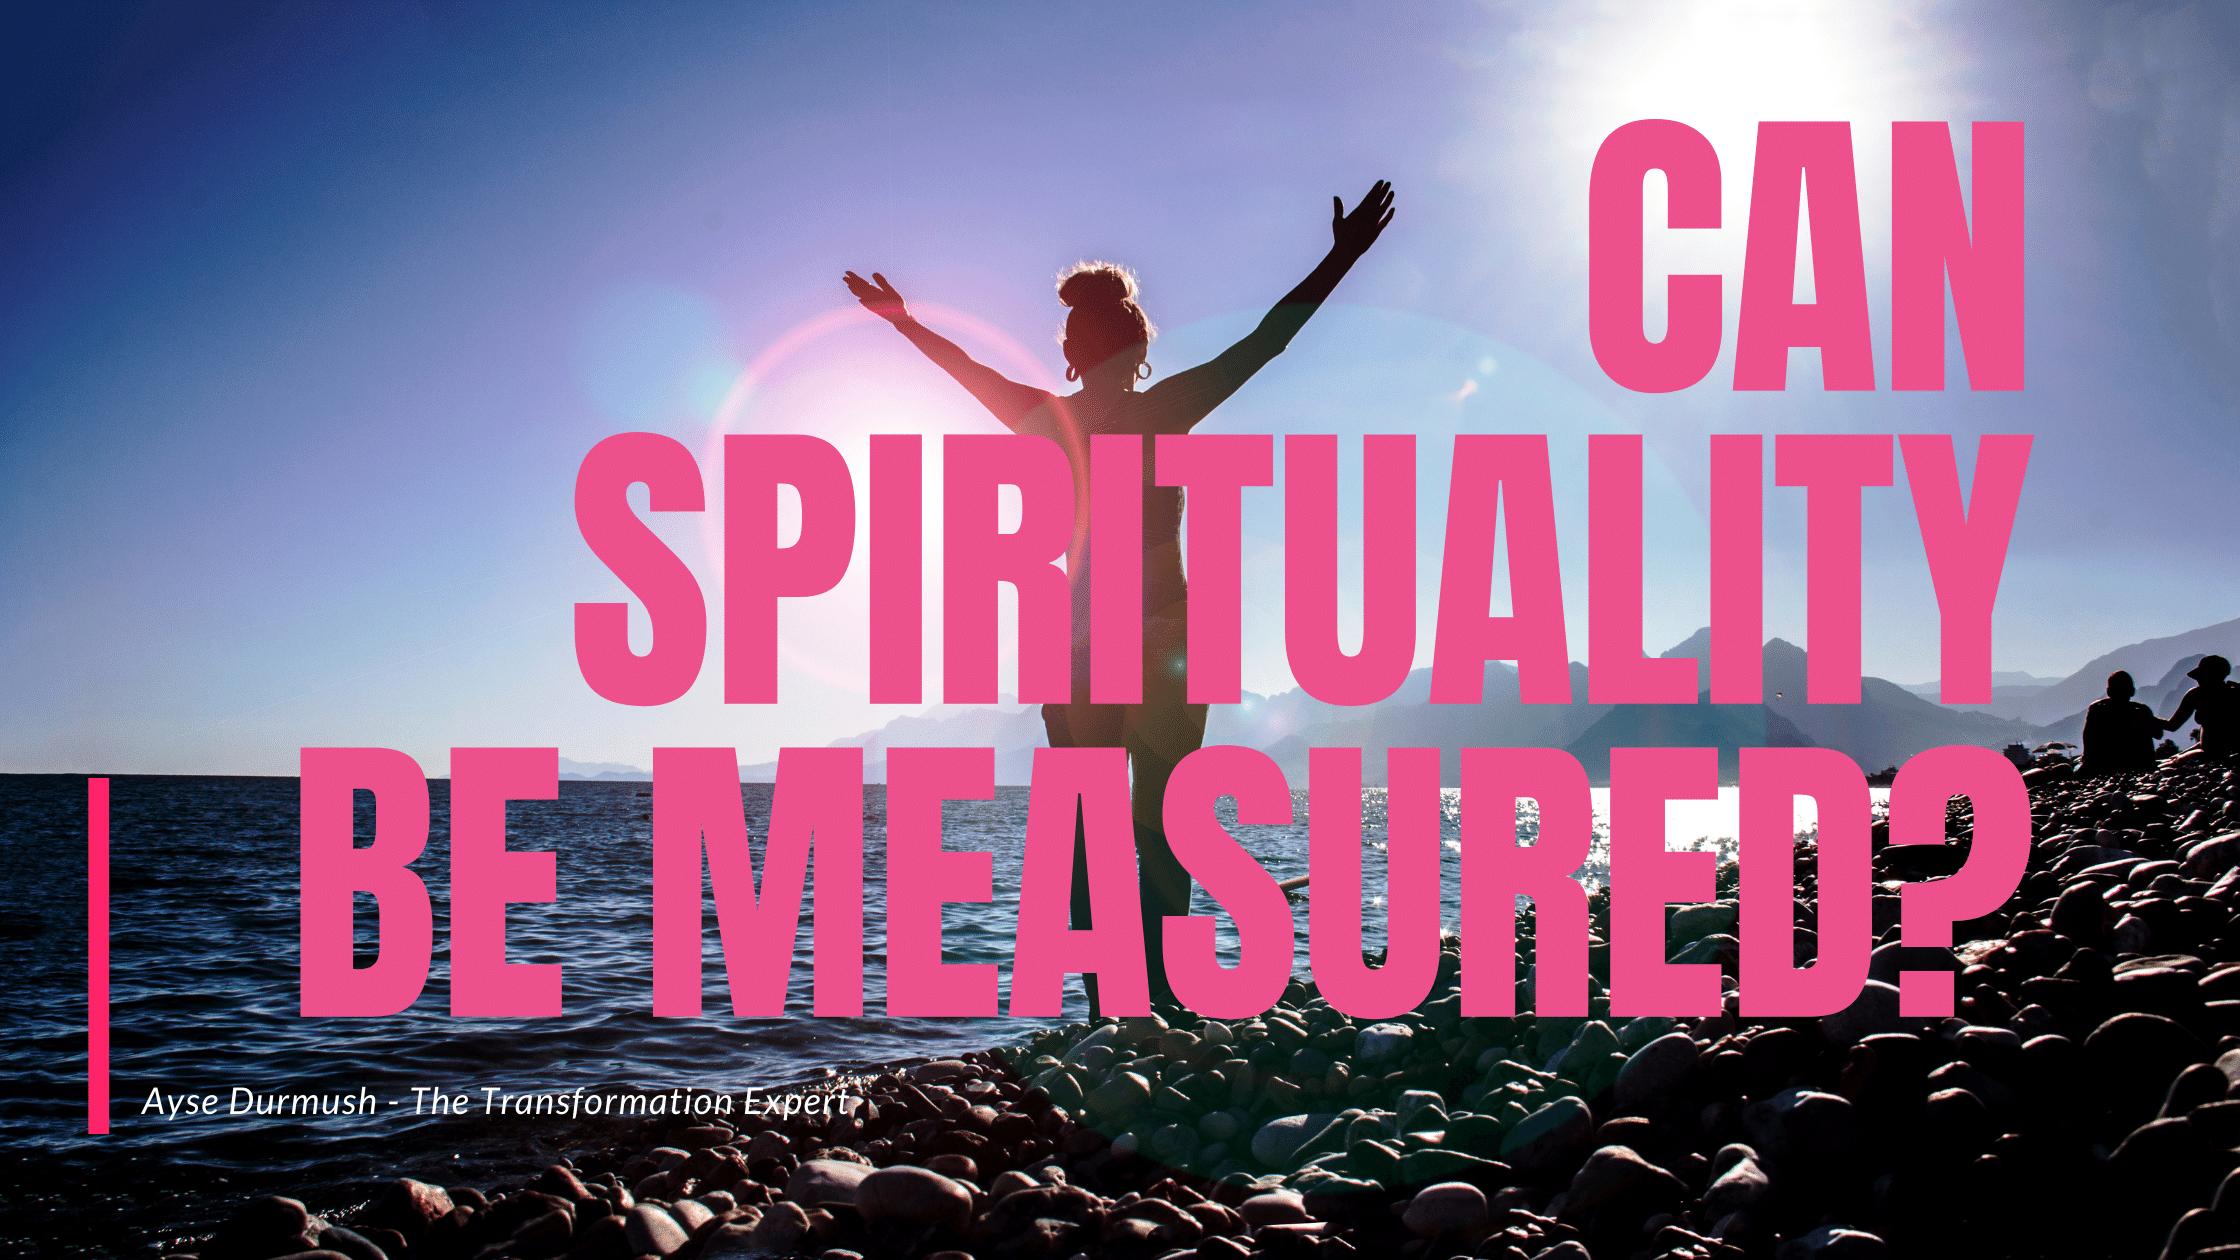 Can Spirituality be measured